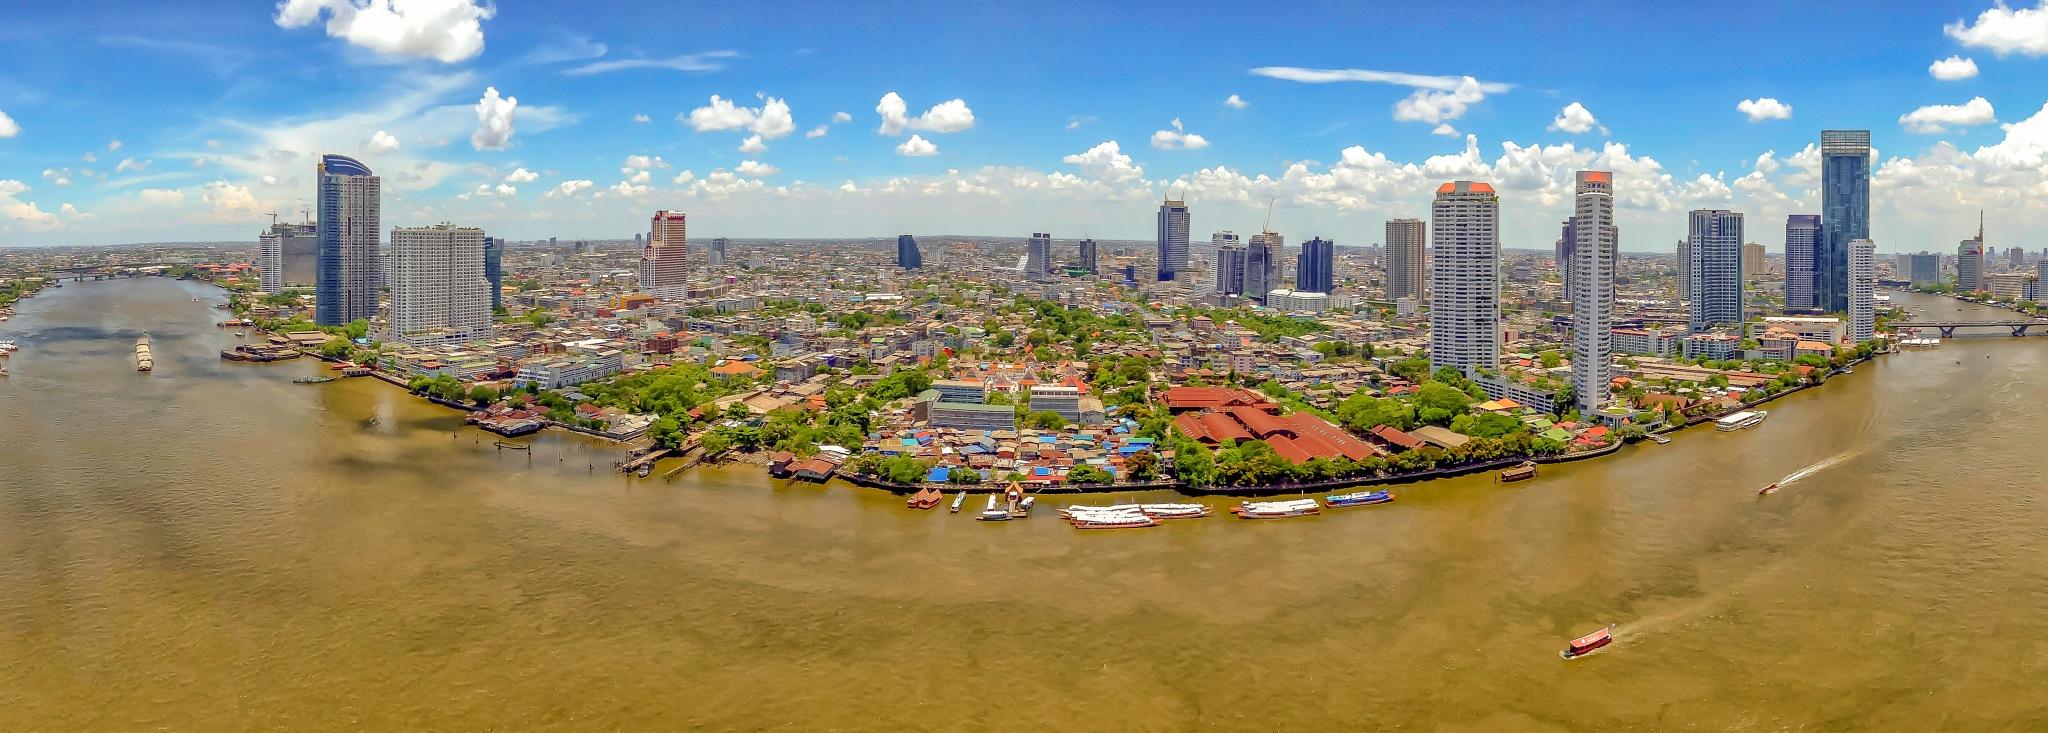 Cityscape Vista of Bangkok by Tremain Tanner